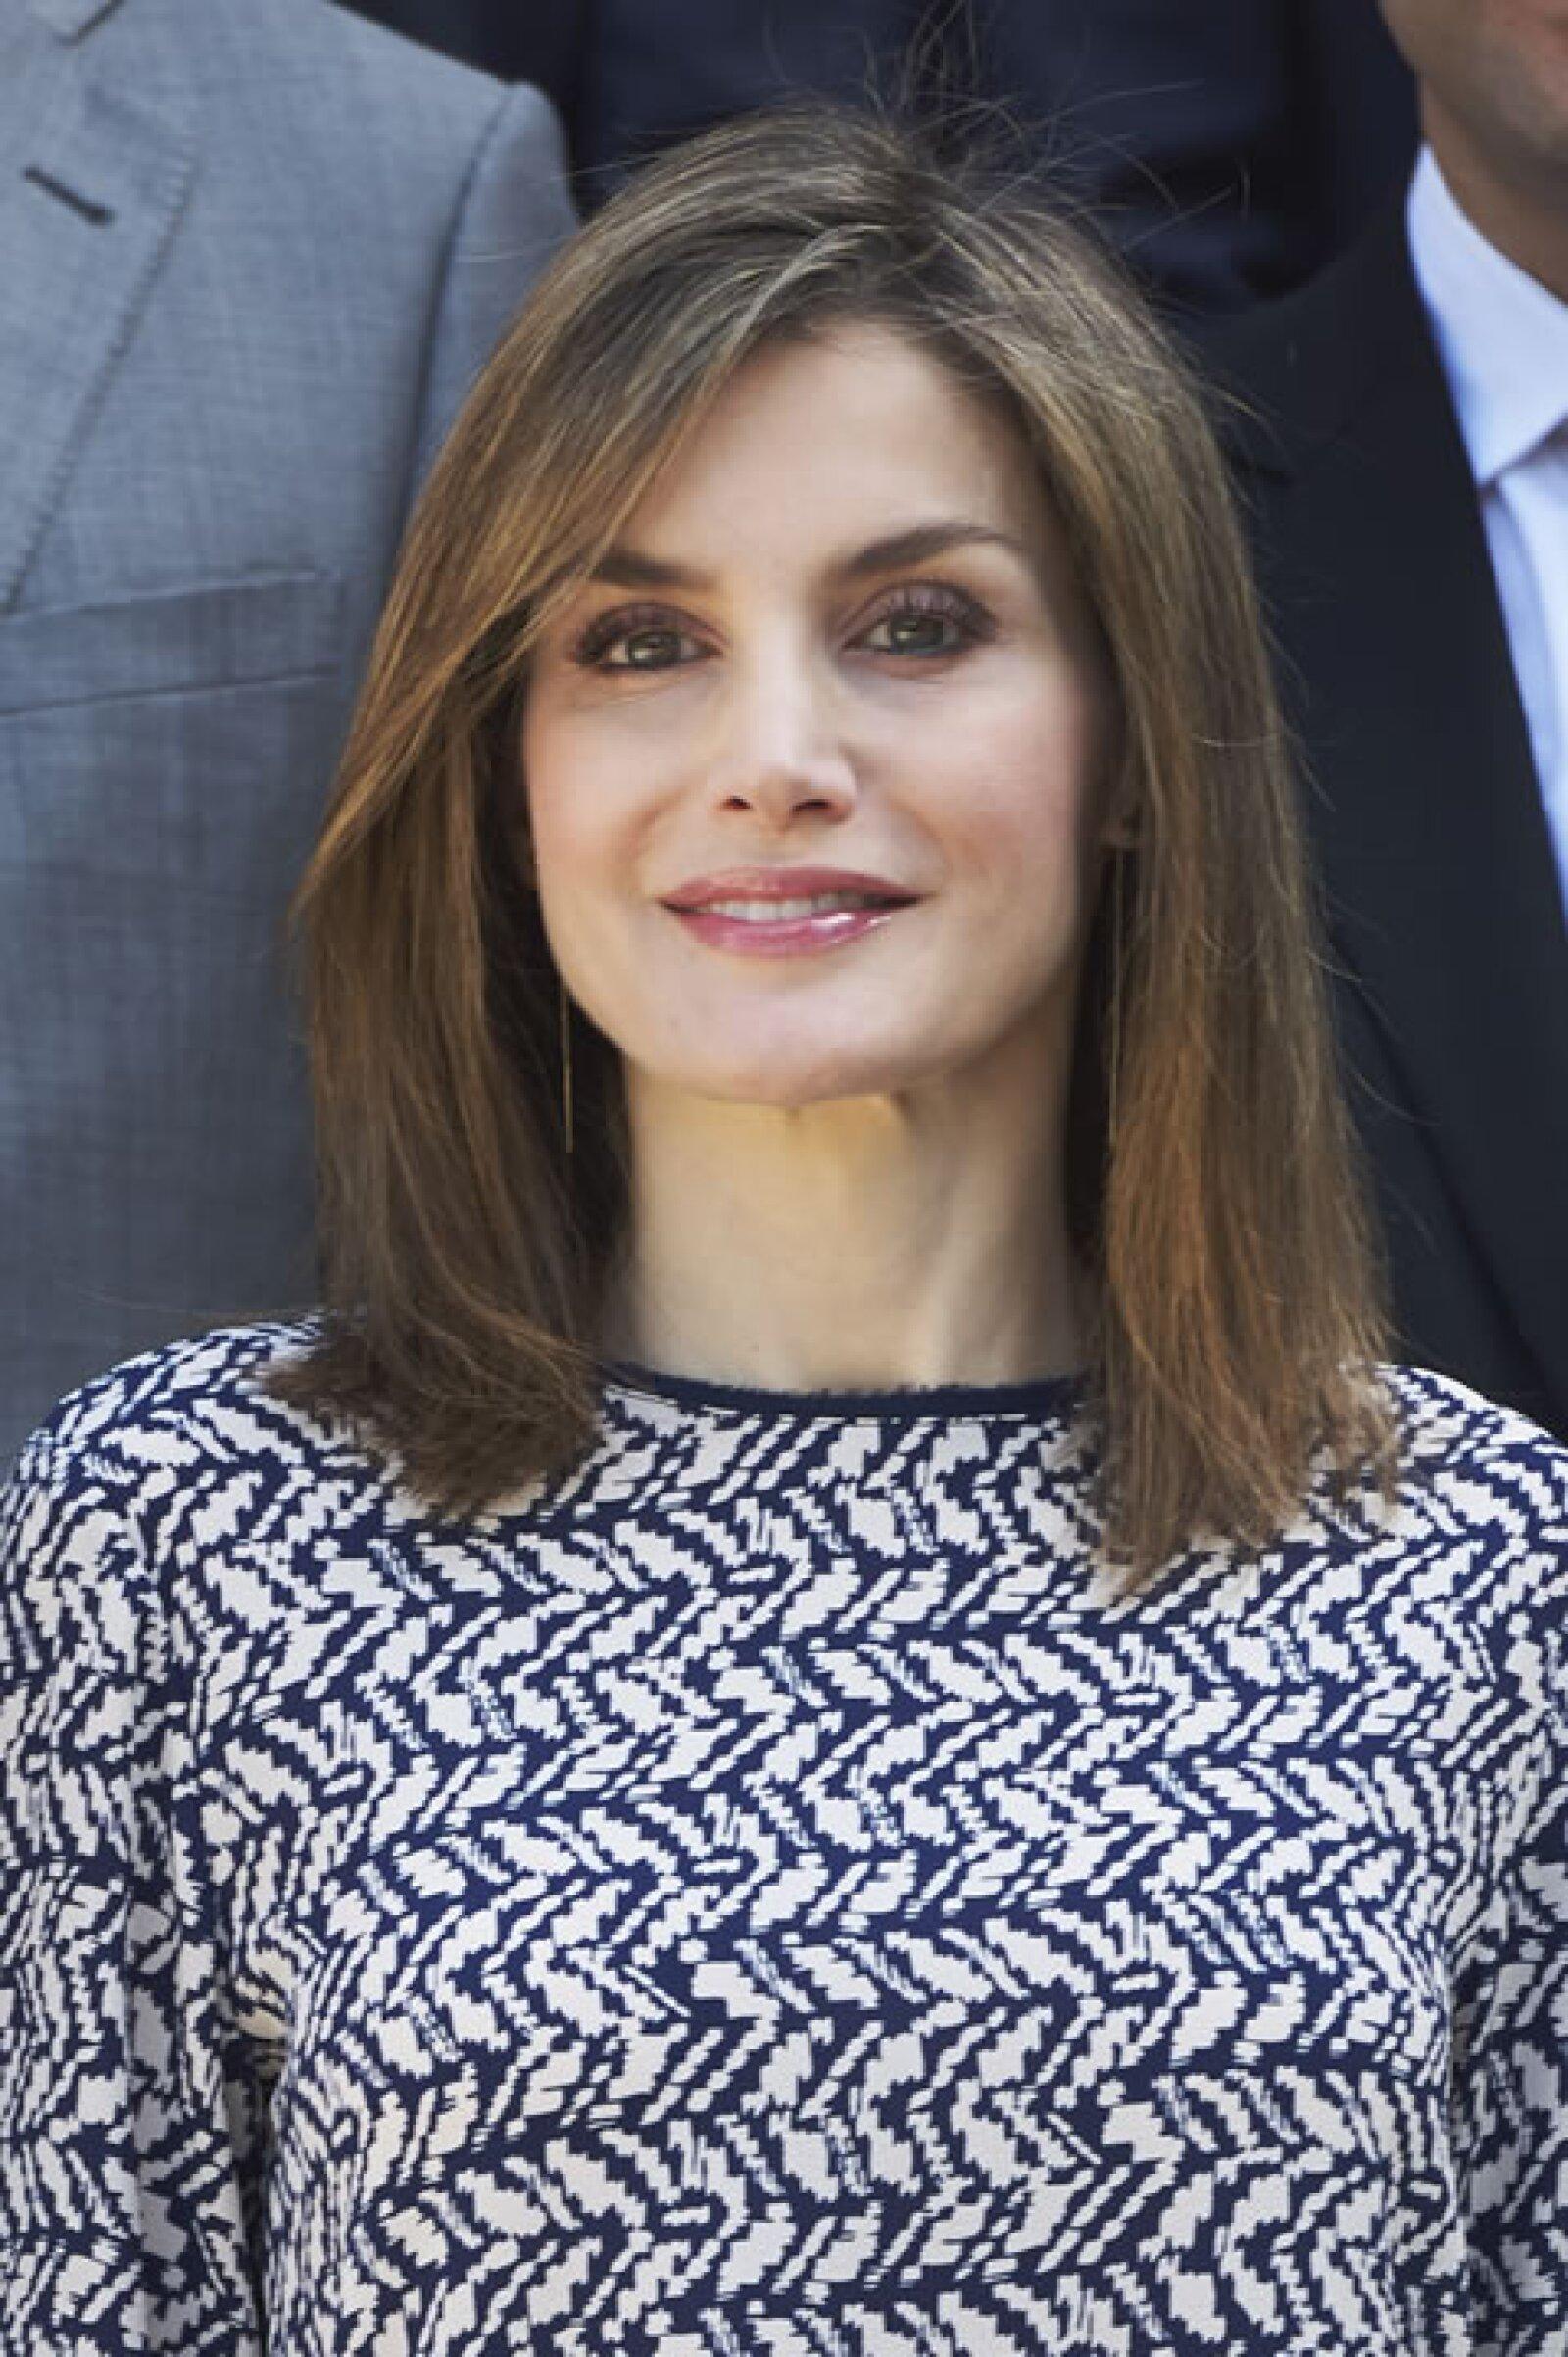 La reina Letizia de España, es reina consorte por su matrimonio con el rey Felipe VI de España.